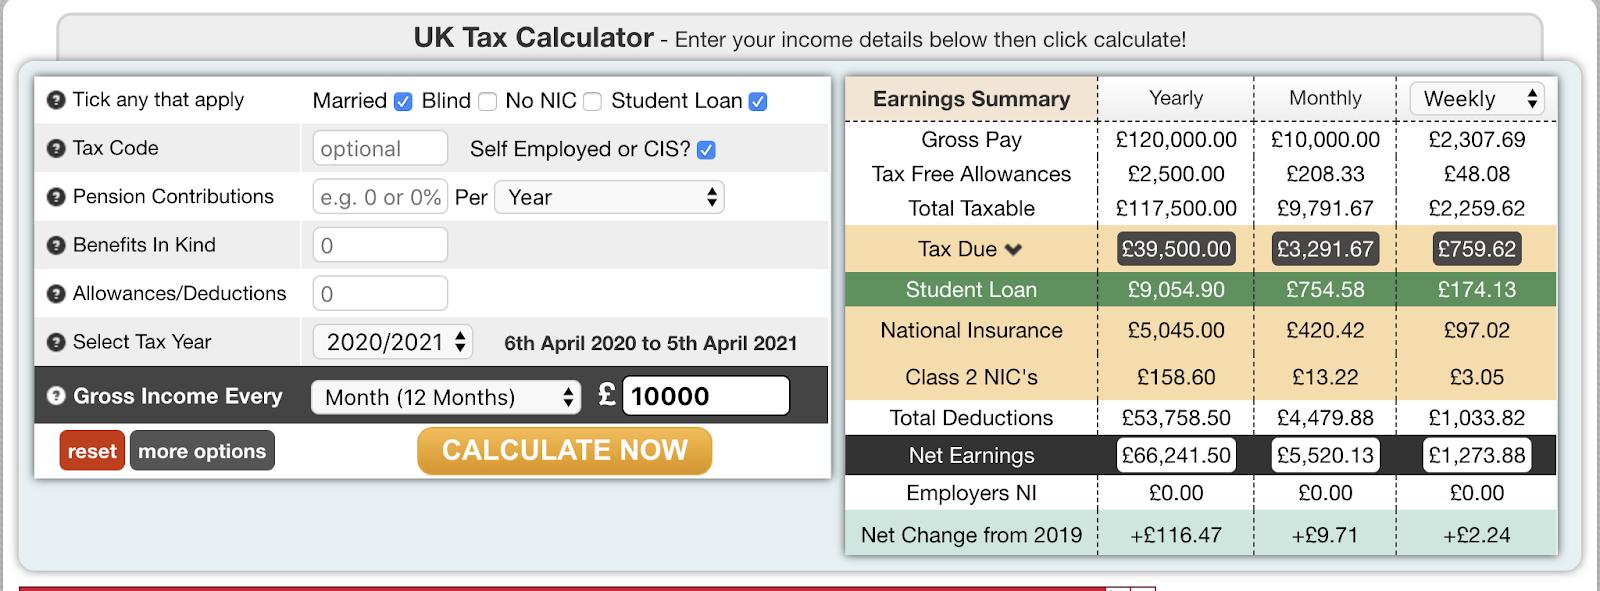 Freelance rate sheet tax calculator